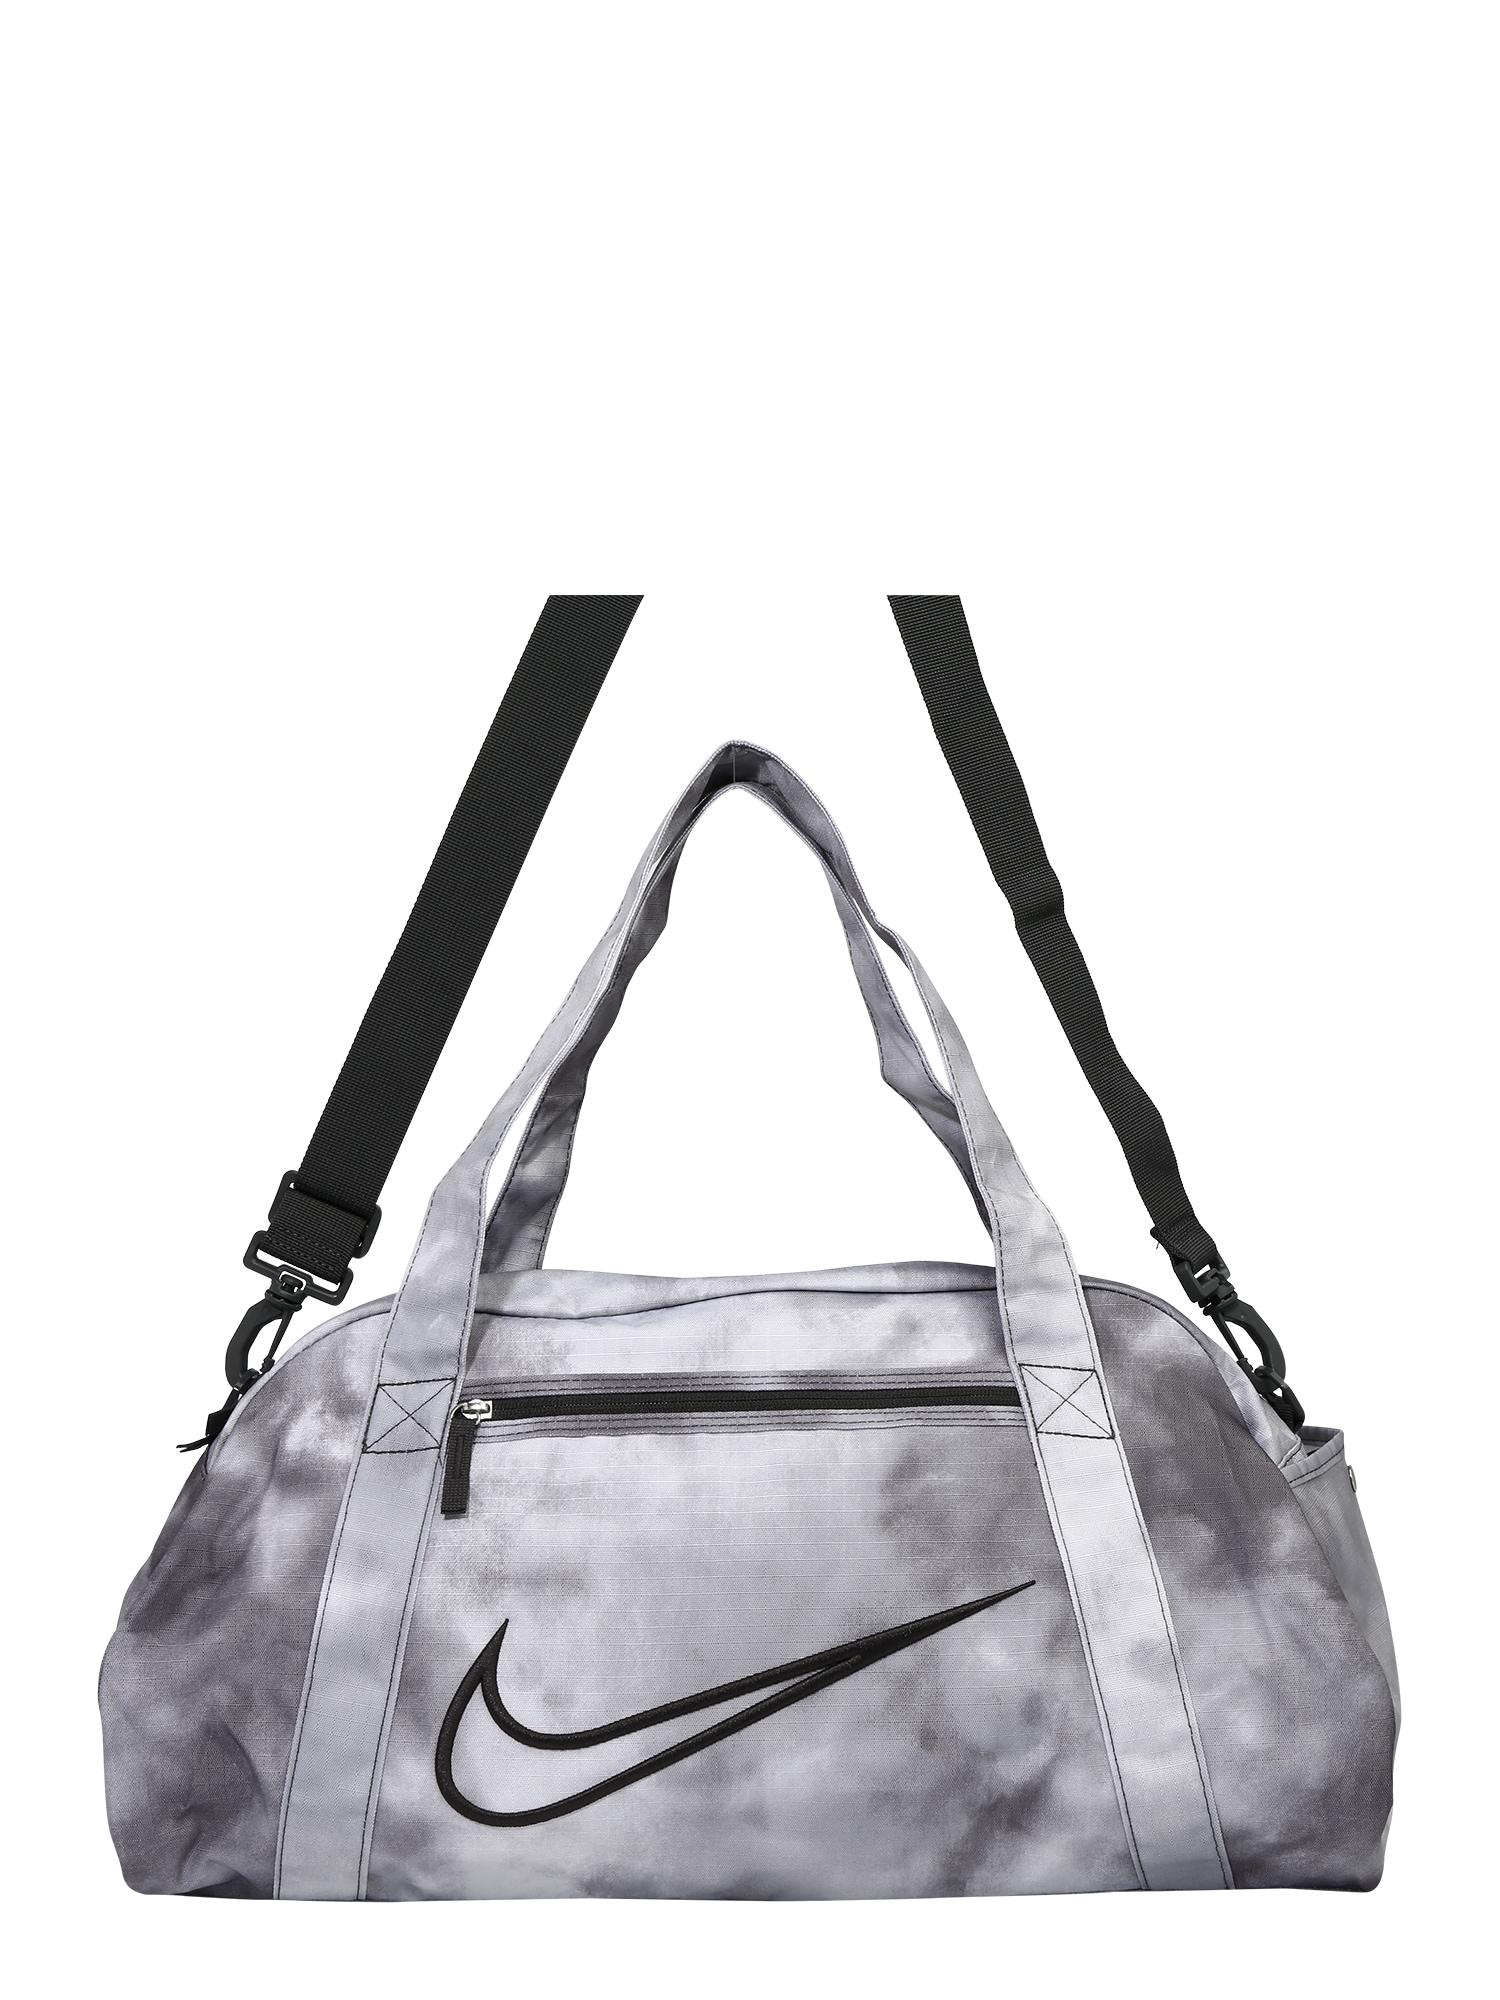 NIKE Sportovní taška  šedá / černá / bílá